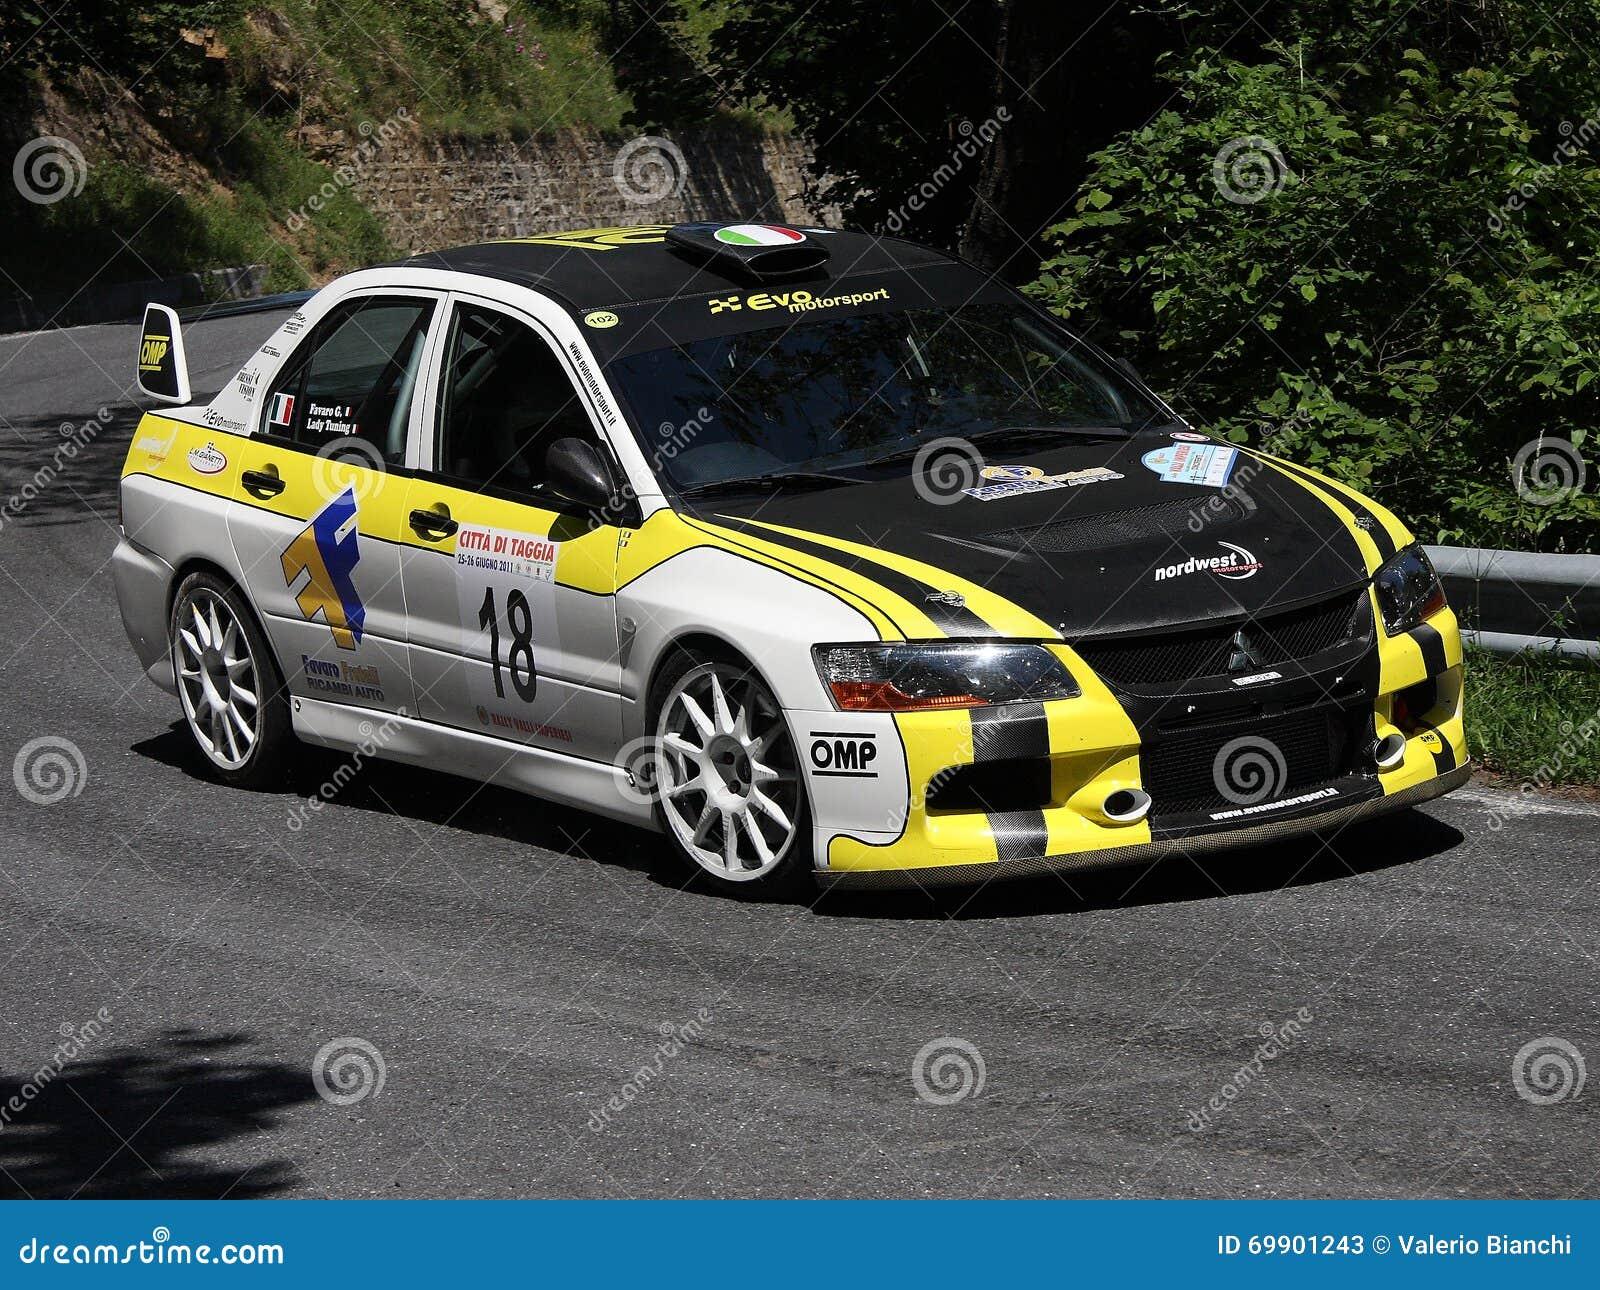 Mitsubishi Evo 9 RC Rally Car Editorial Stock Photo - Image: 69901243